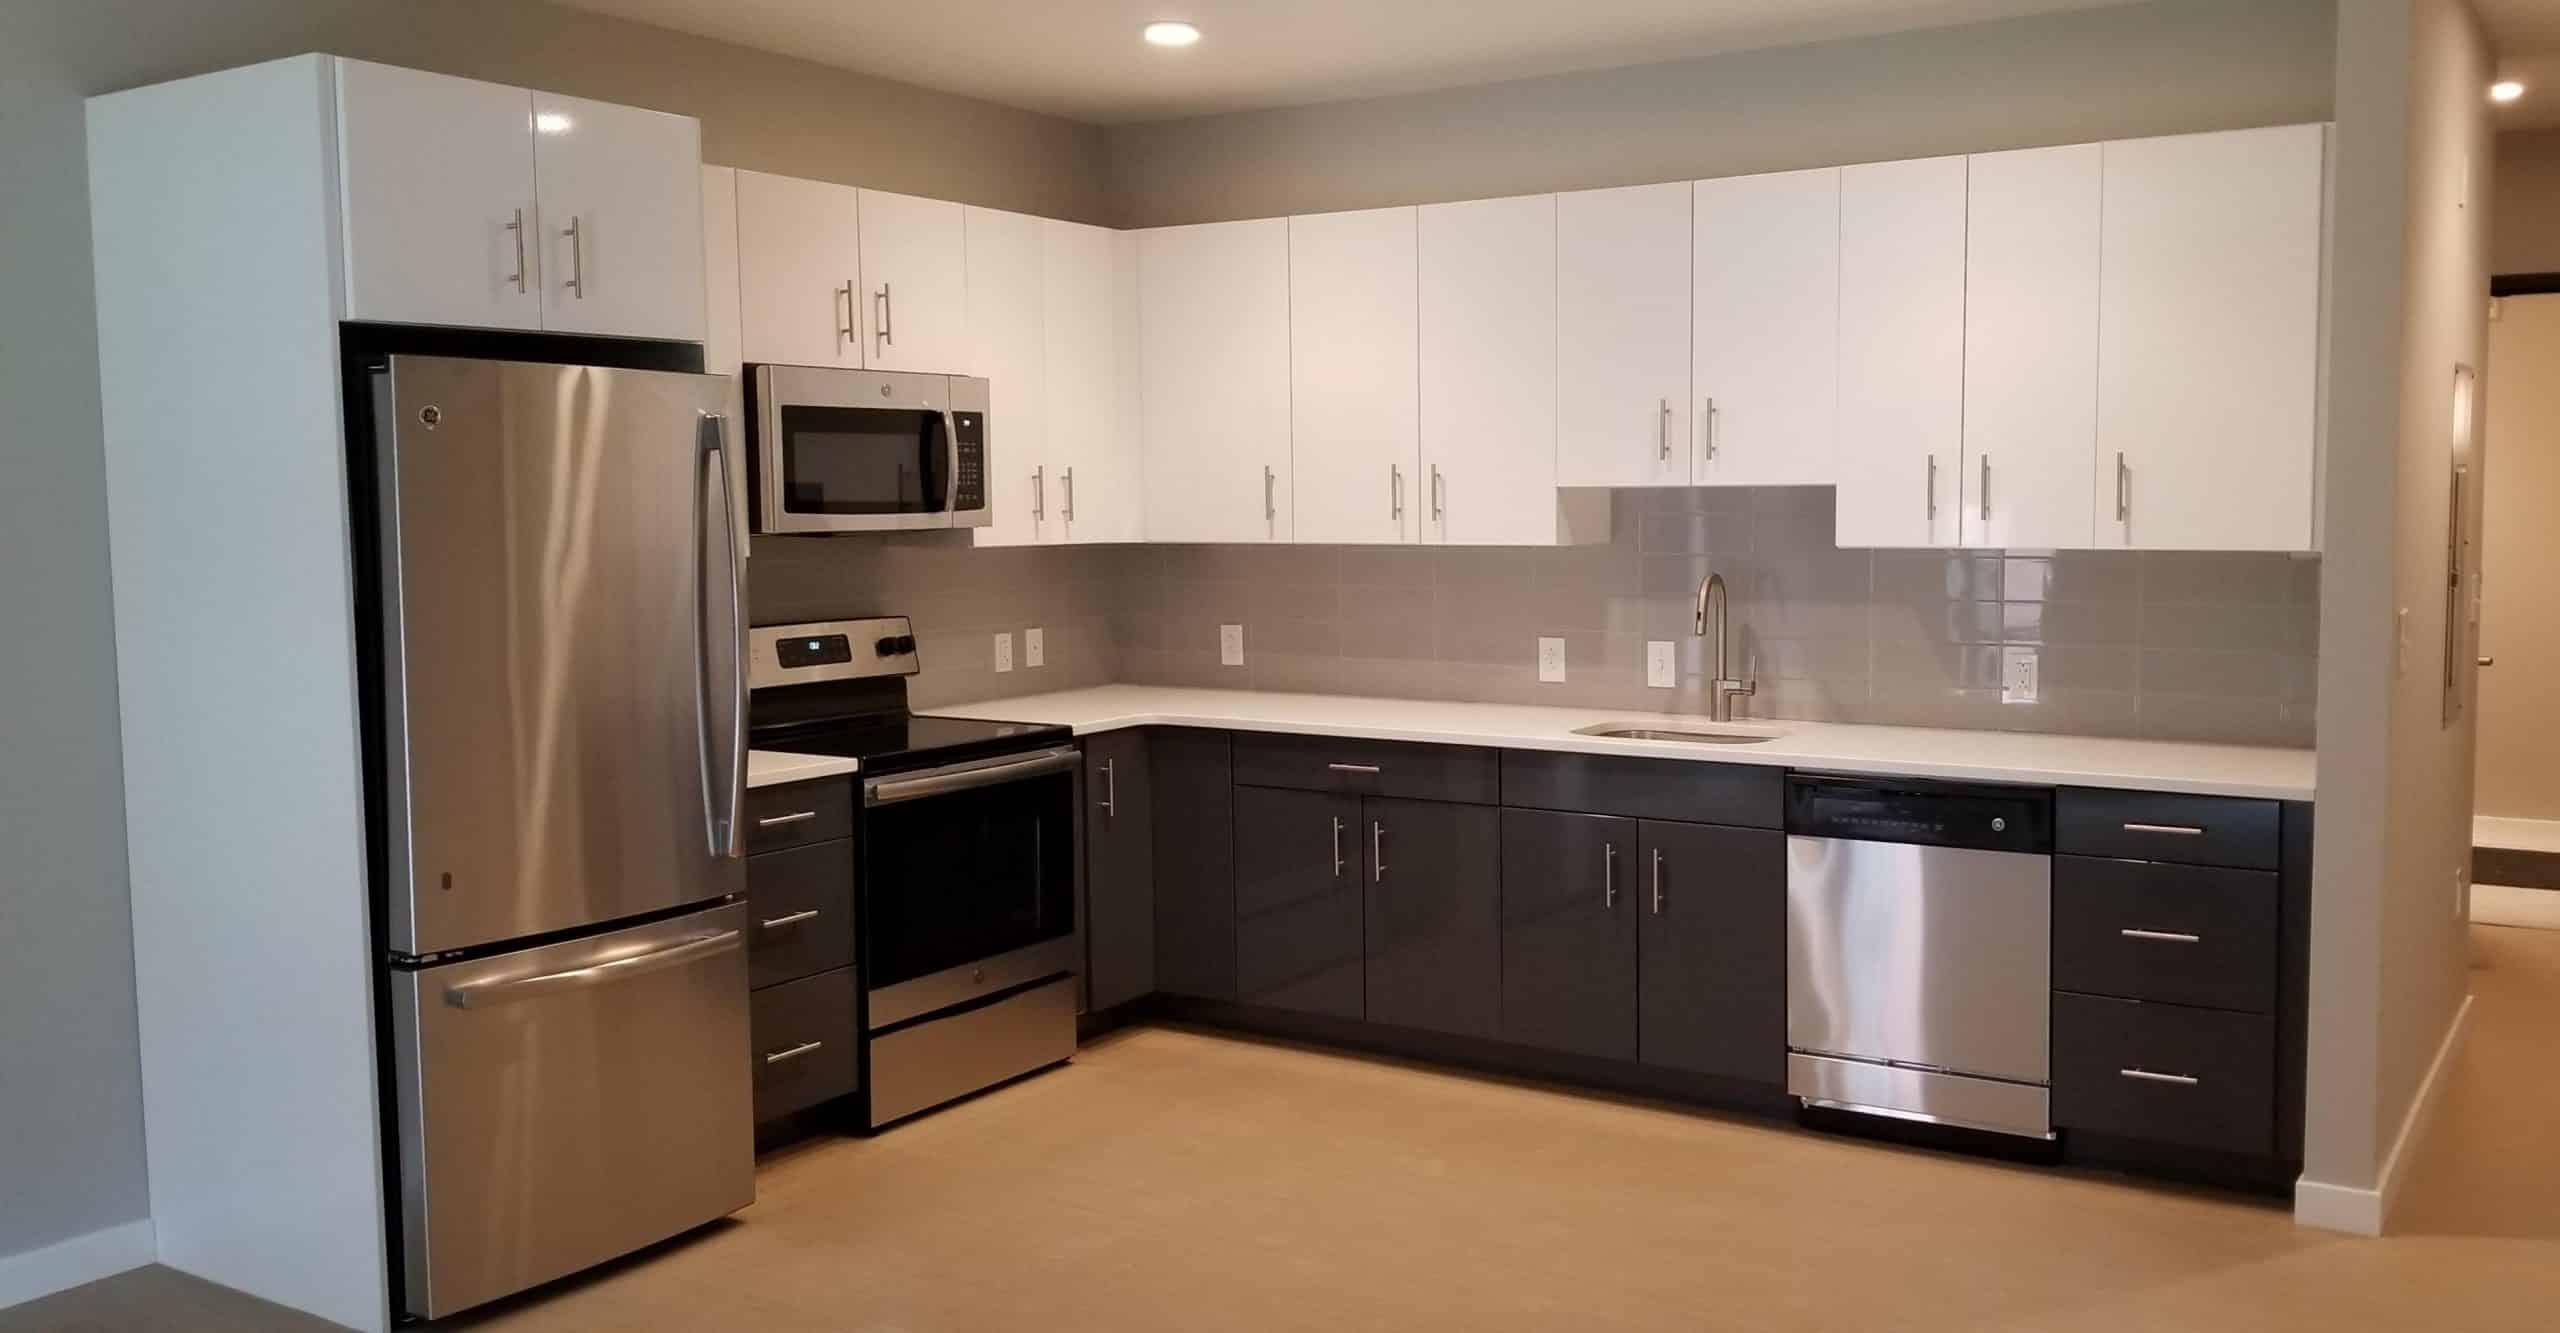 Model kitchen at Old City Philadelphia apartment